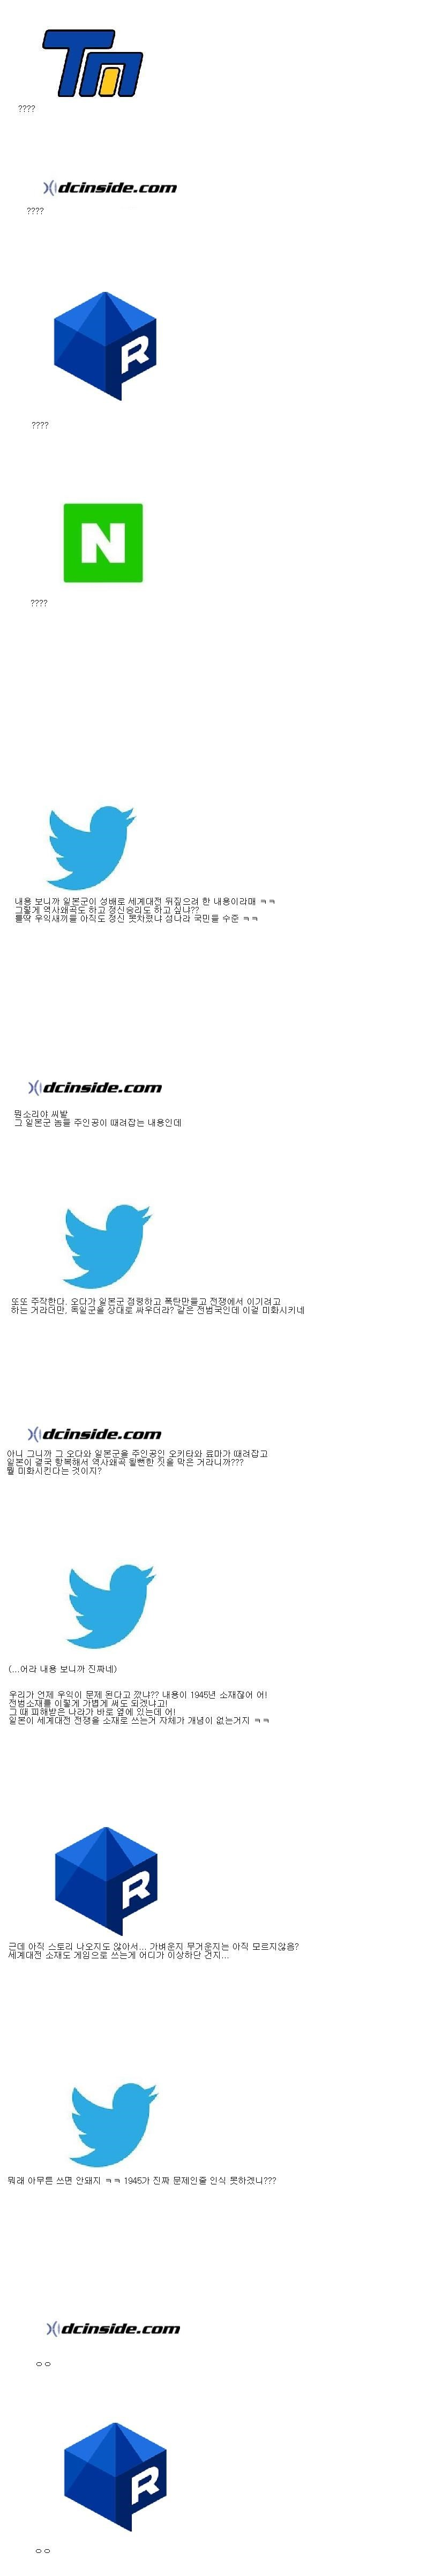 viewimage.php?id=20bbd729&no=24b0d769e1d32ca73dec81fa11d028314d3faebecfec25ed6aa779bc795ef317165f9d7a6fc6b6a88058057280fe453b7b66d97bc85c096d3e0e20c278029665d5f7d075a74ab704941407fee46053a1ed8c7421fdf159a510541d